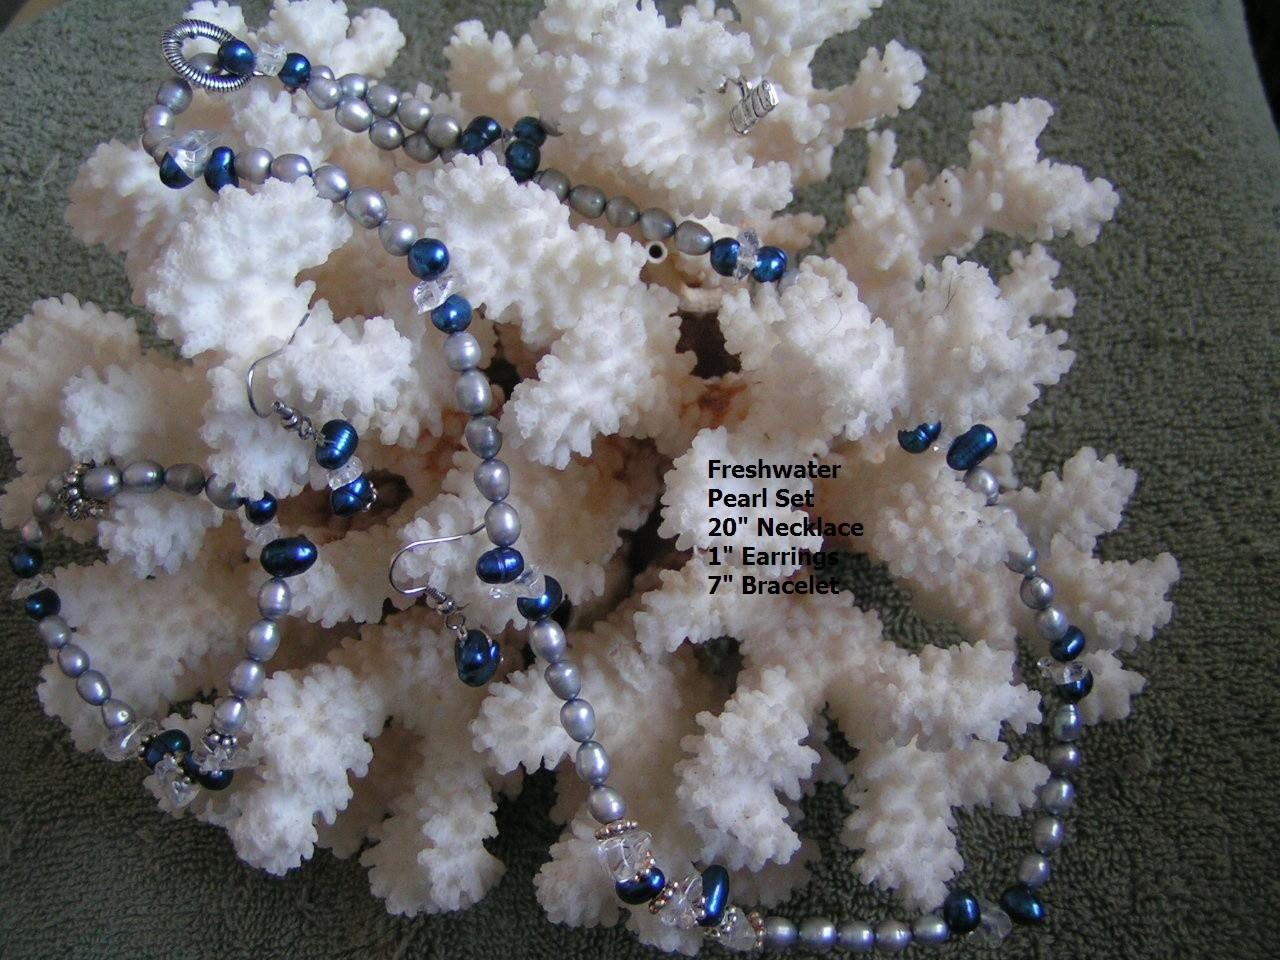 3PC Freshwater Pearl Set Free Shipping